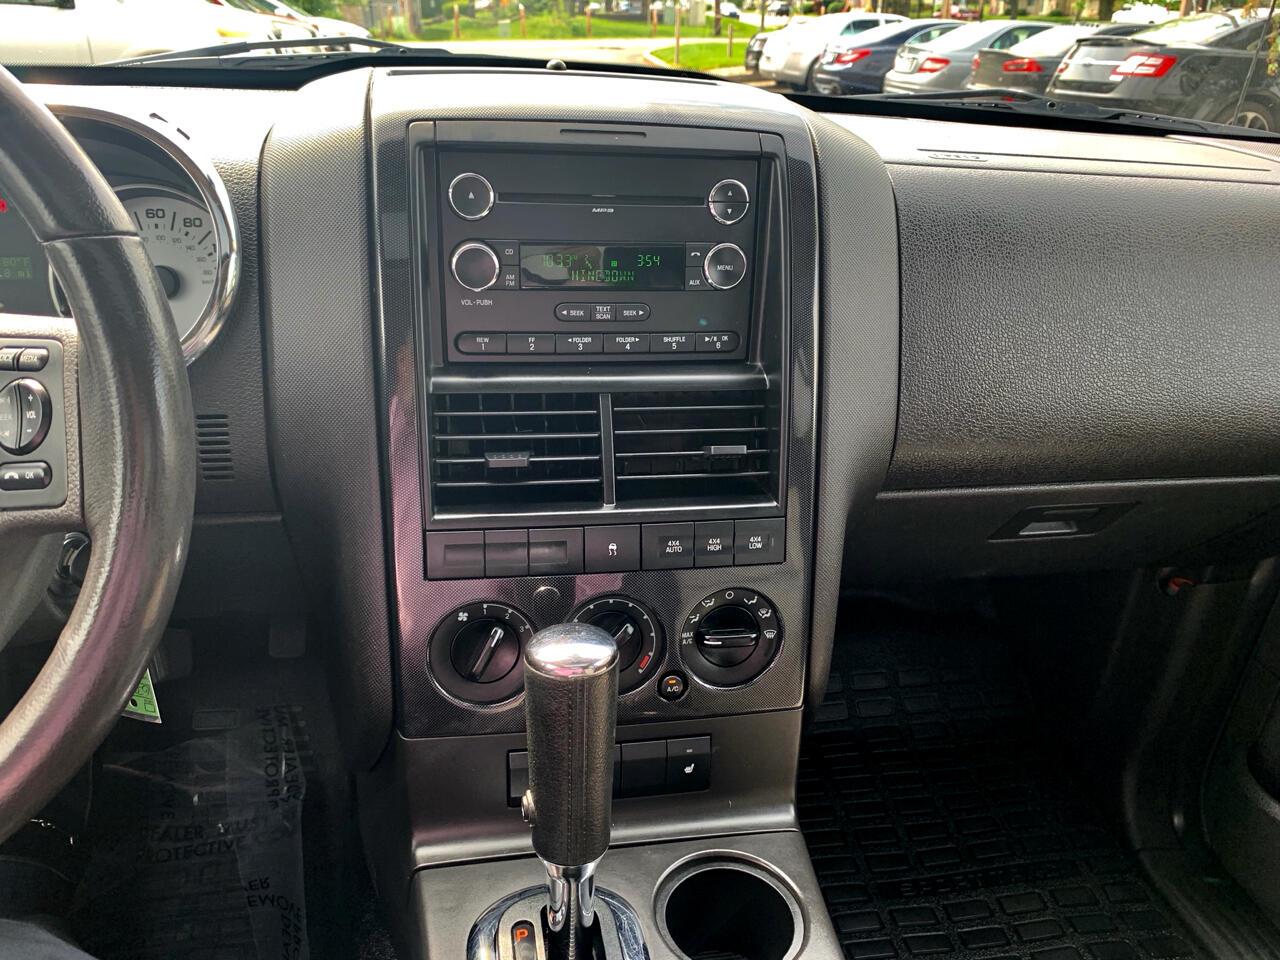 2008 Ford Explorer Sport Trac Limited 4.0L 4WD